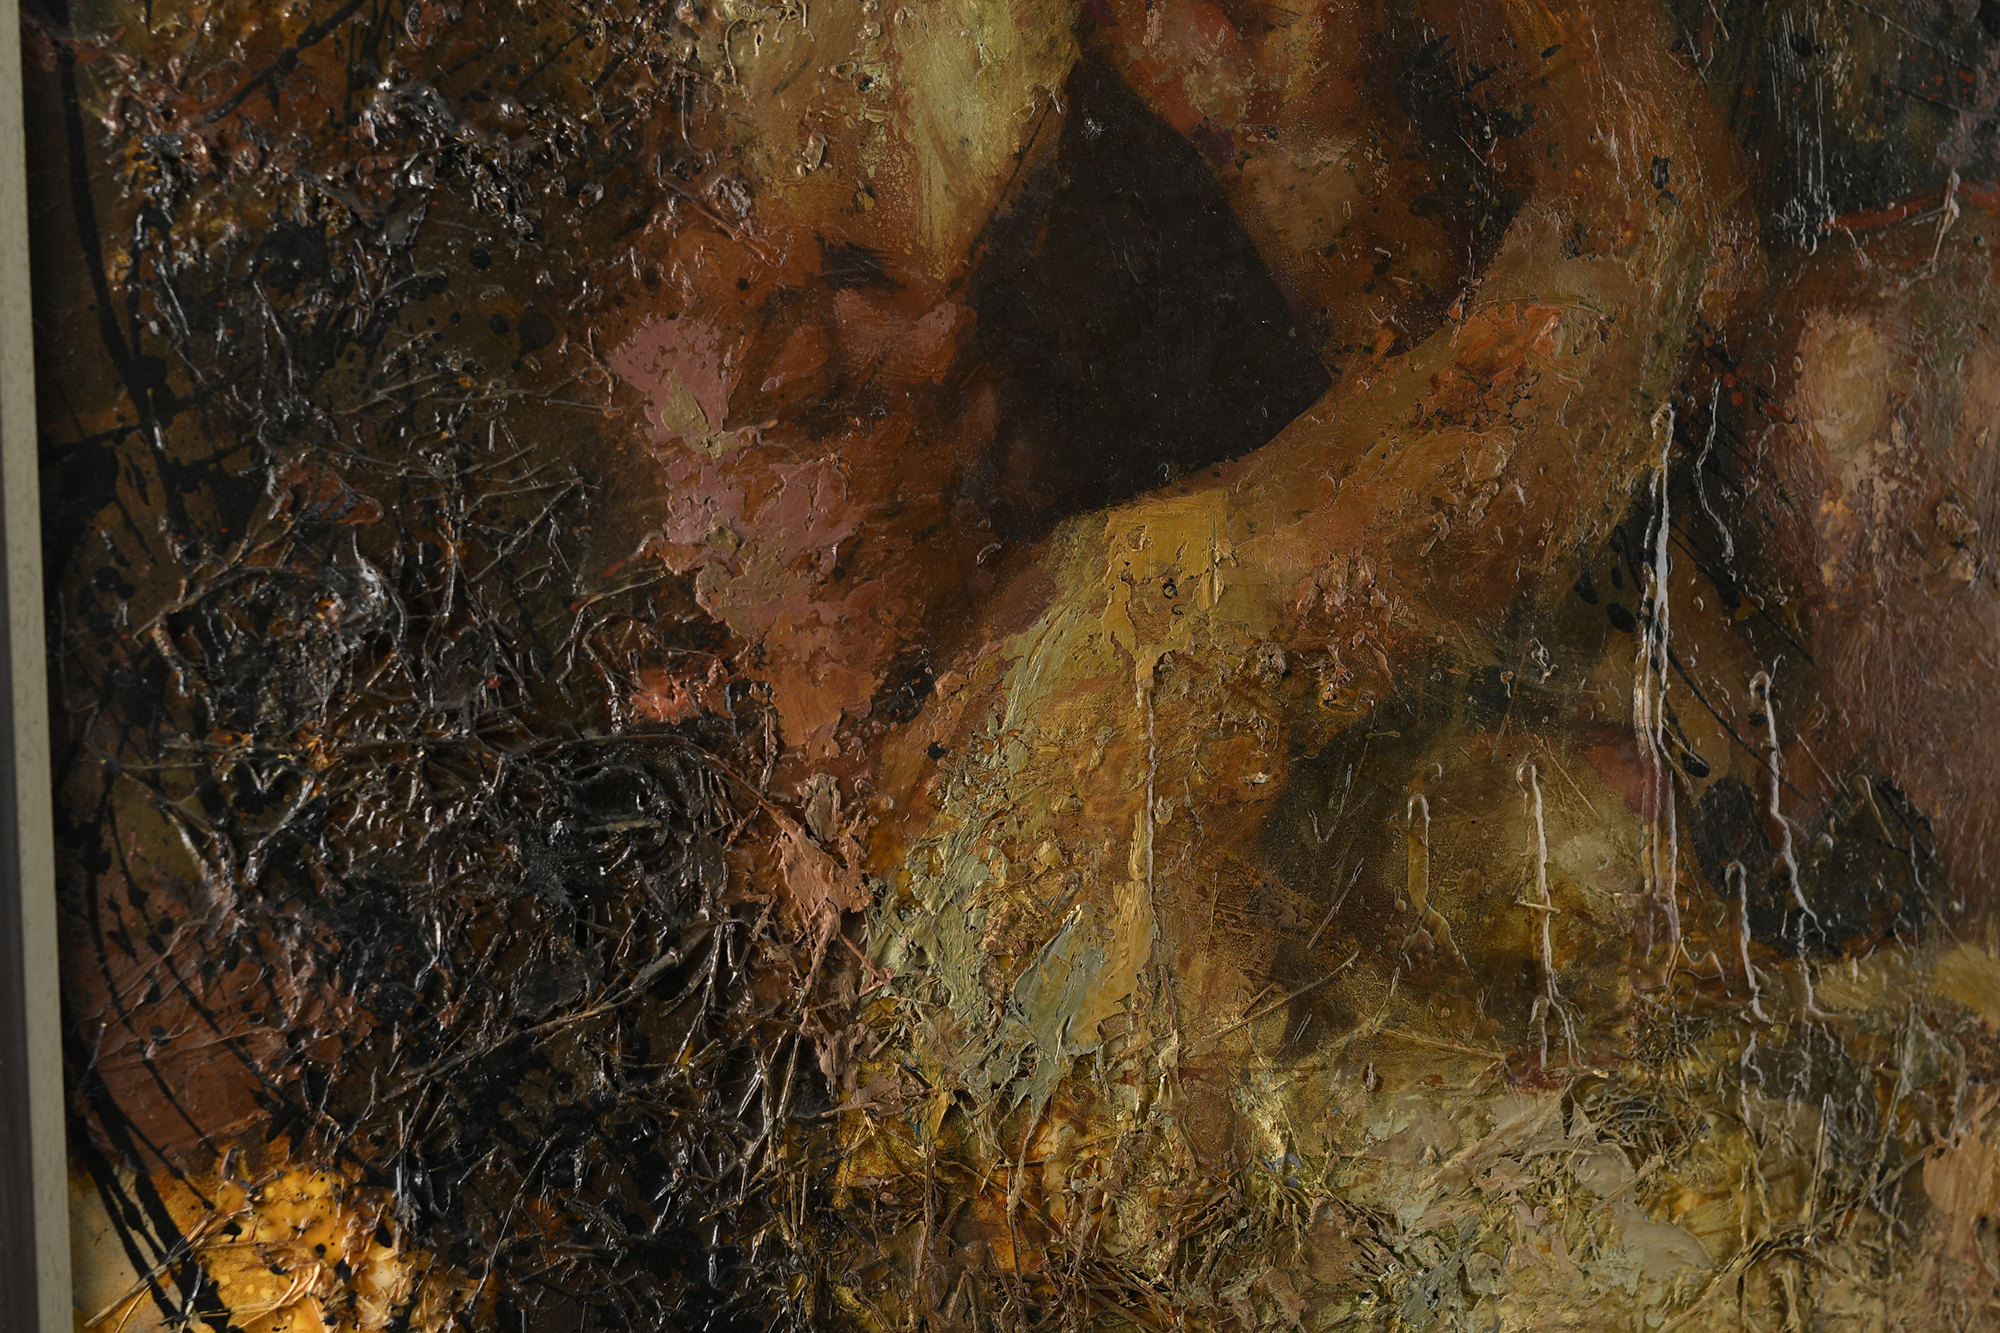 Stunning Original Painting by Renowned Scottish artist Alan McGowan. - Image 2 of 22